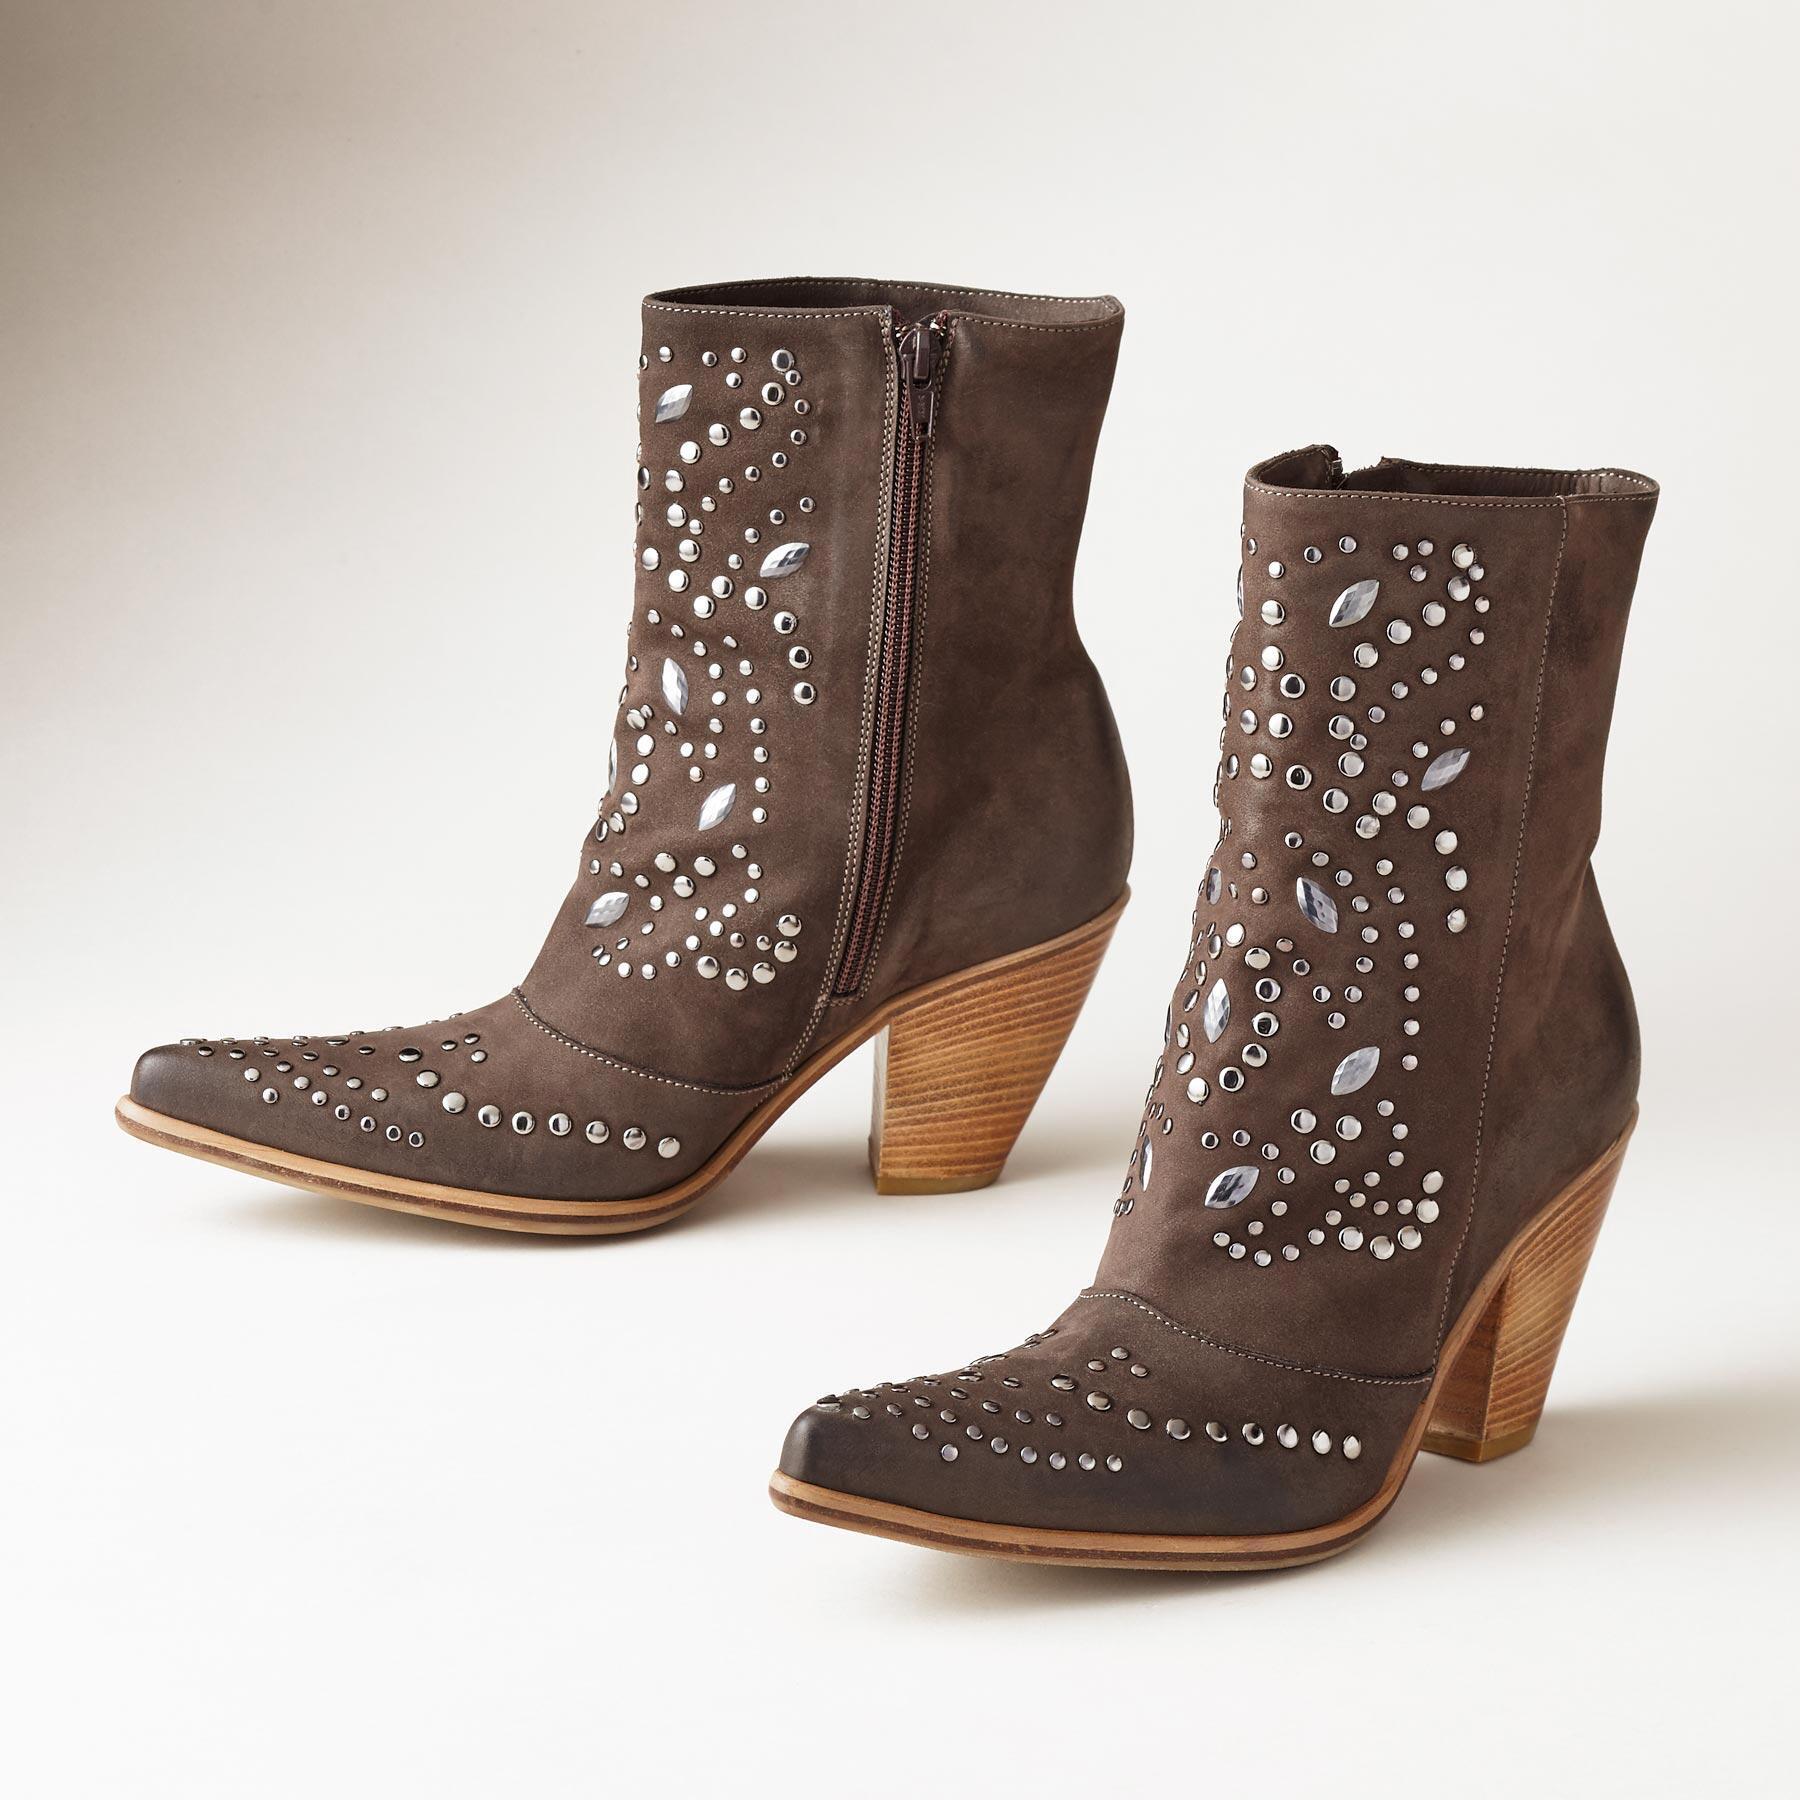 New Horizon Boots